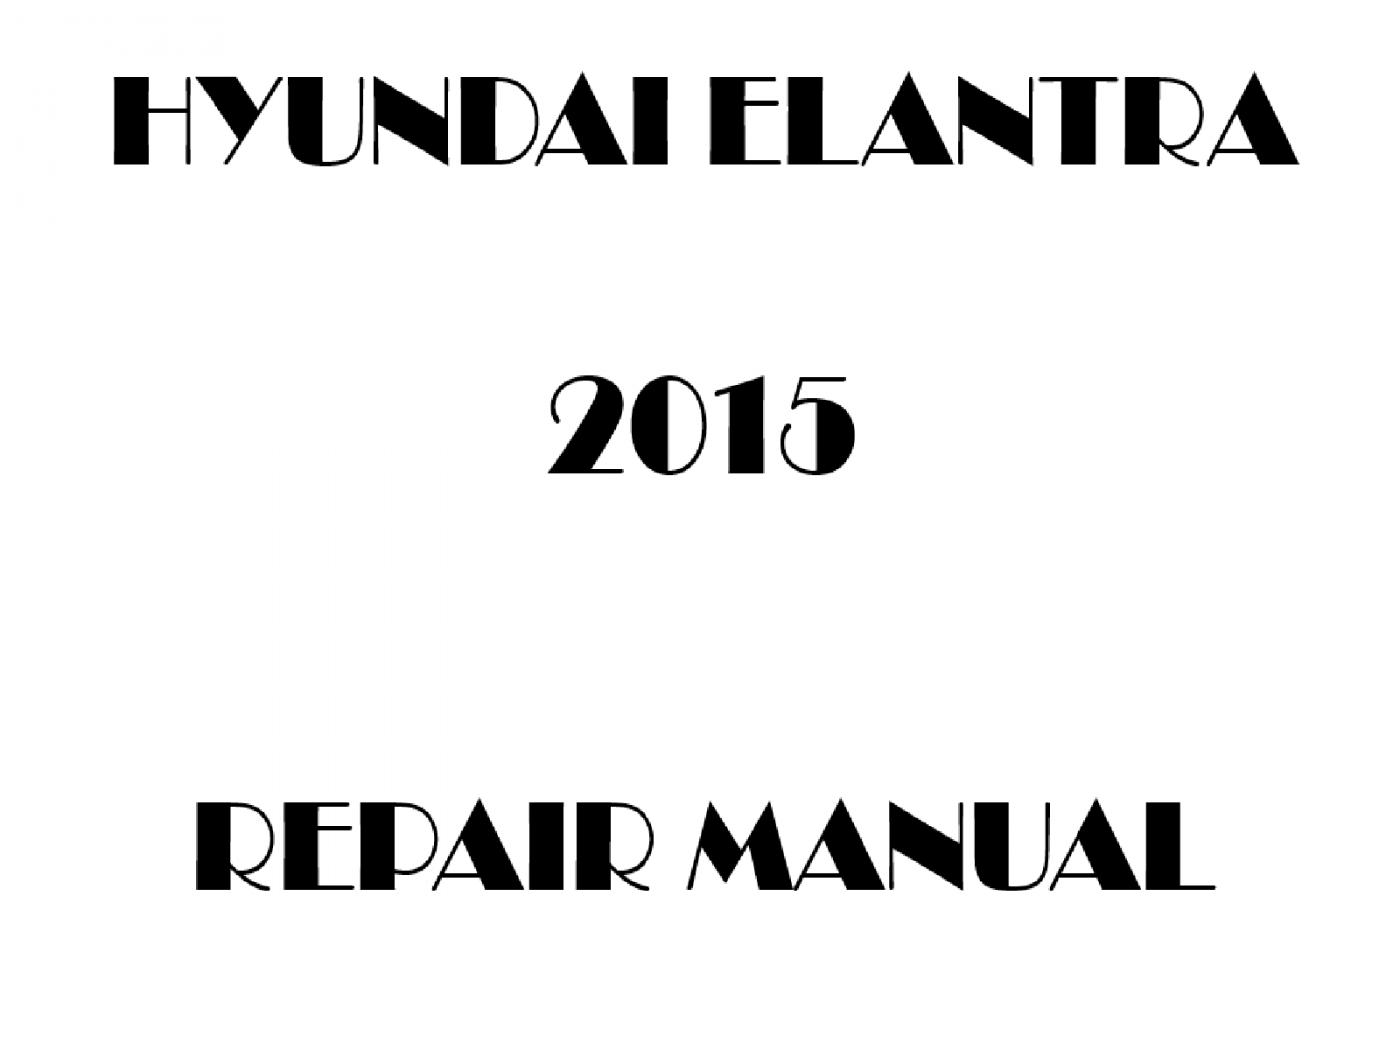 2015 Hyundai Elantra repair manual